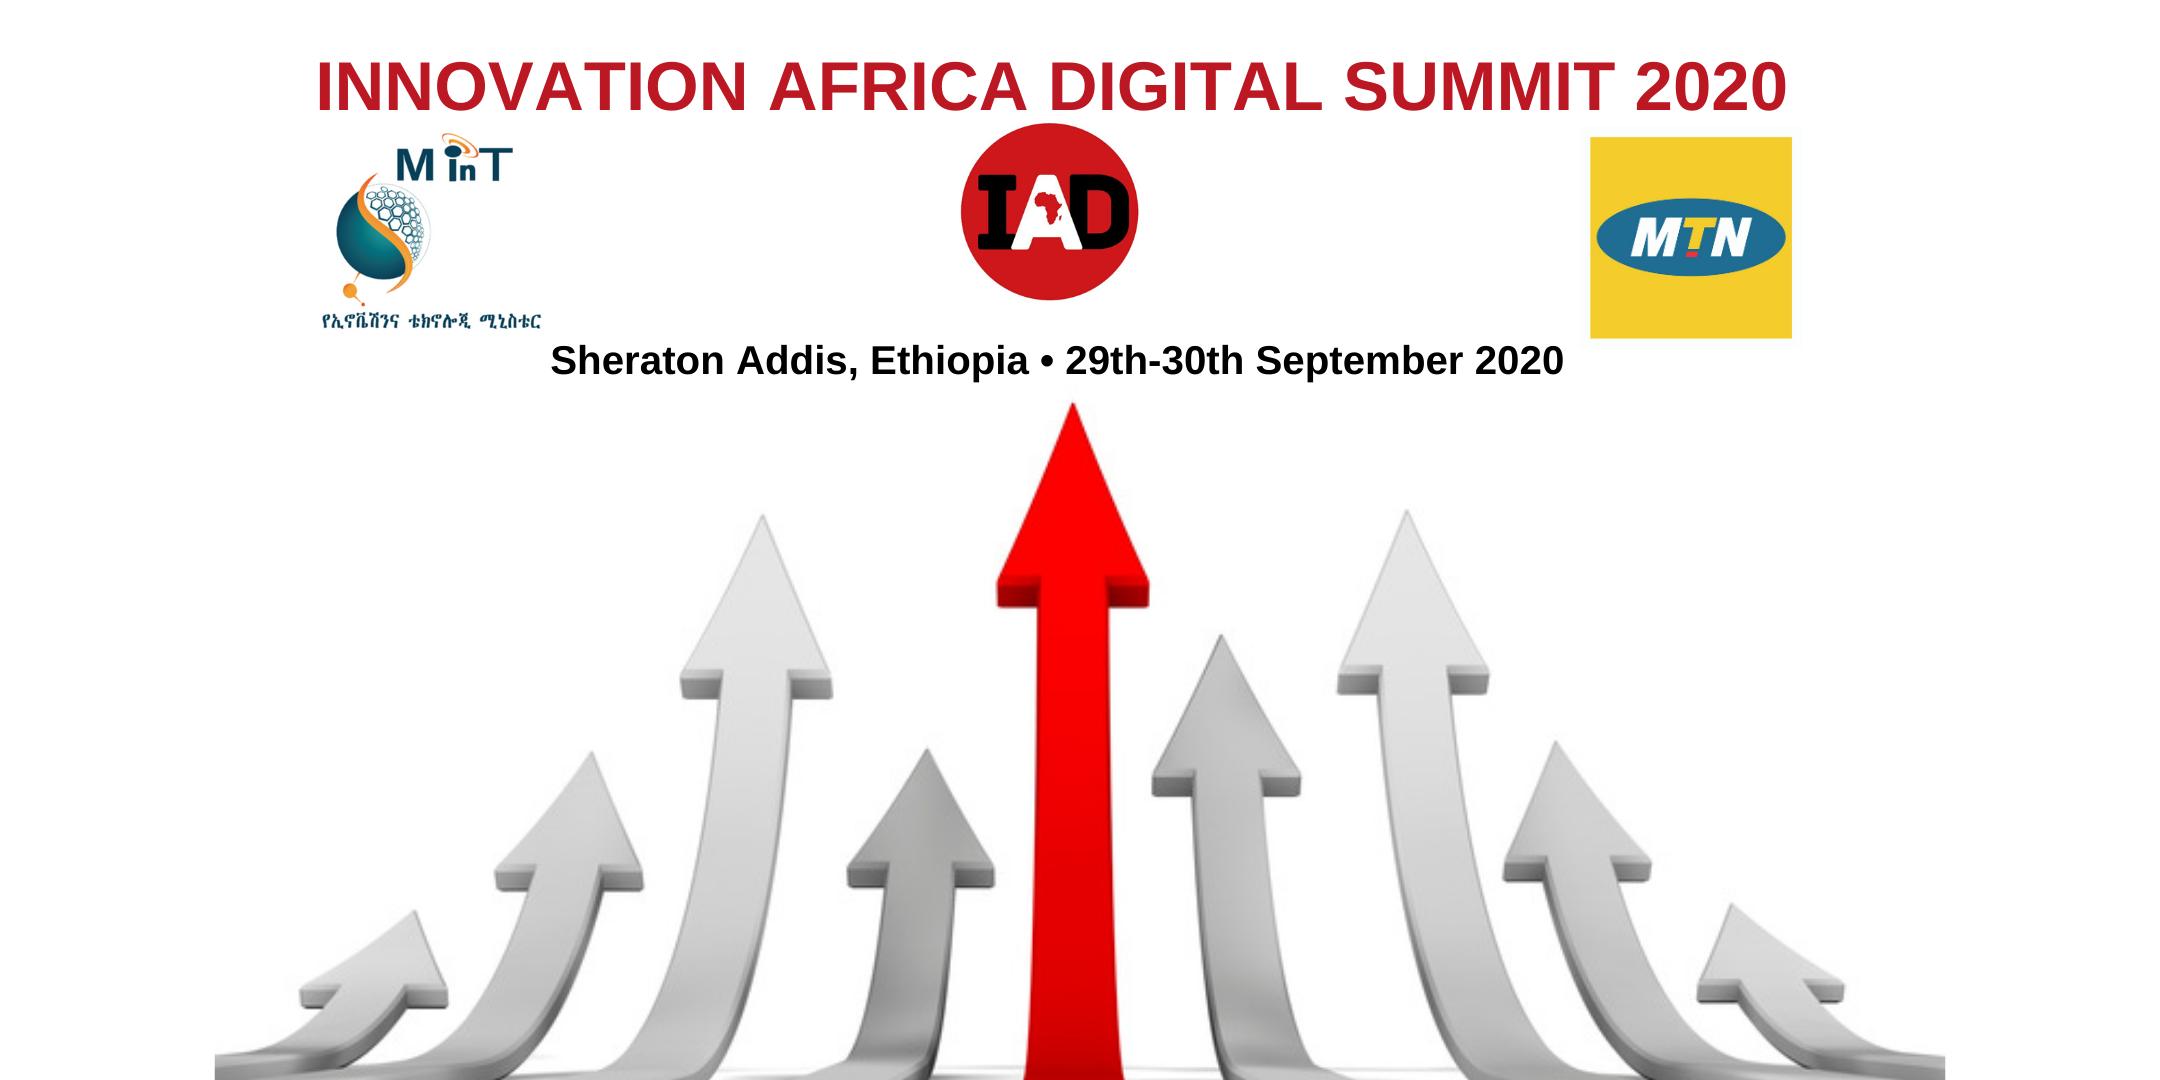 Innovation Africa Digital Summit 2020 – 'NATIONAL AGENDA ACCELERATION'